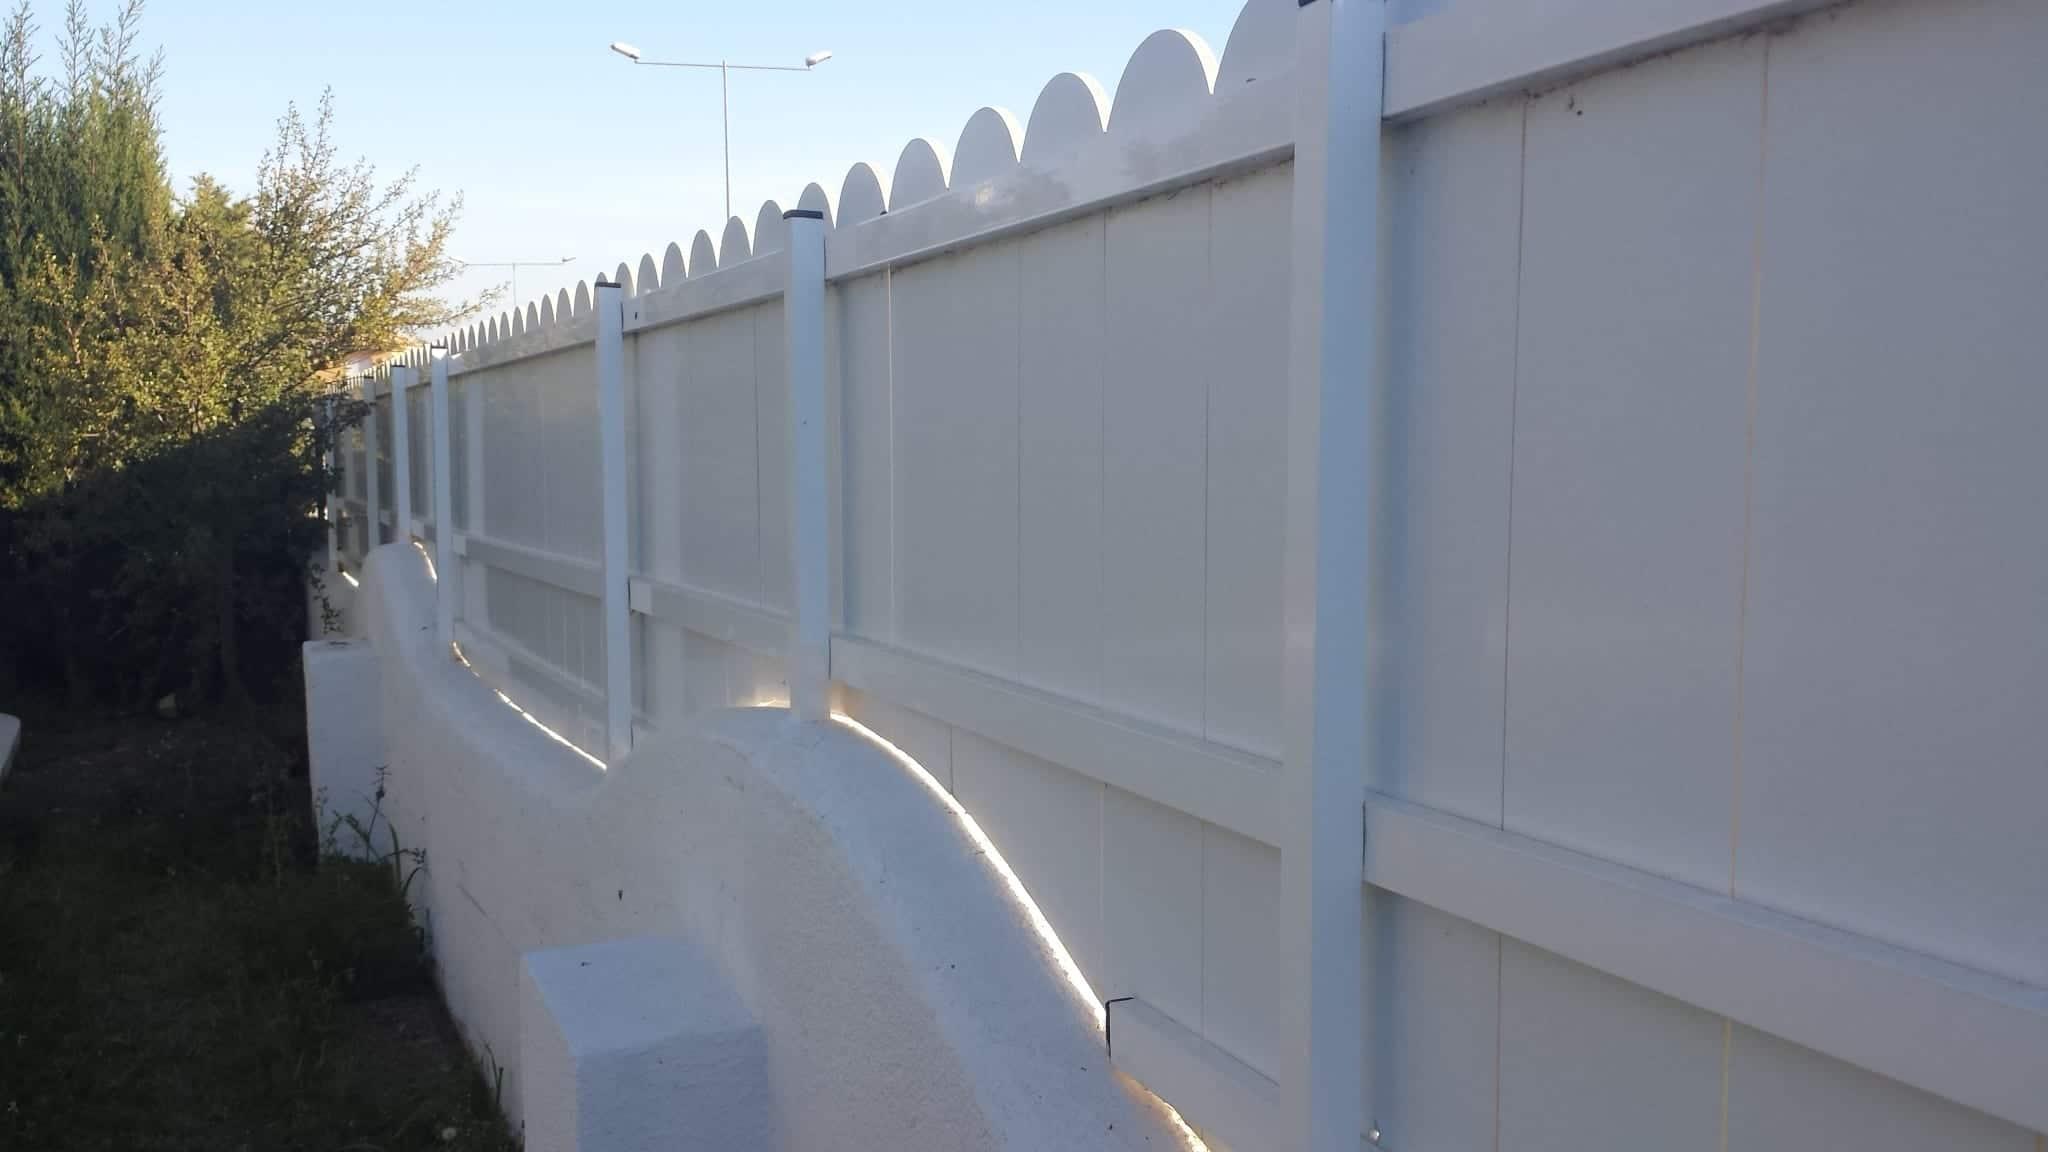 vinuesa vallas cercados modelos valla verja lamas pvc ocultacion residencial. Black Bedroom Furniture Sets. Home Design Ideas